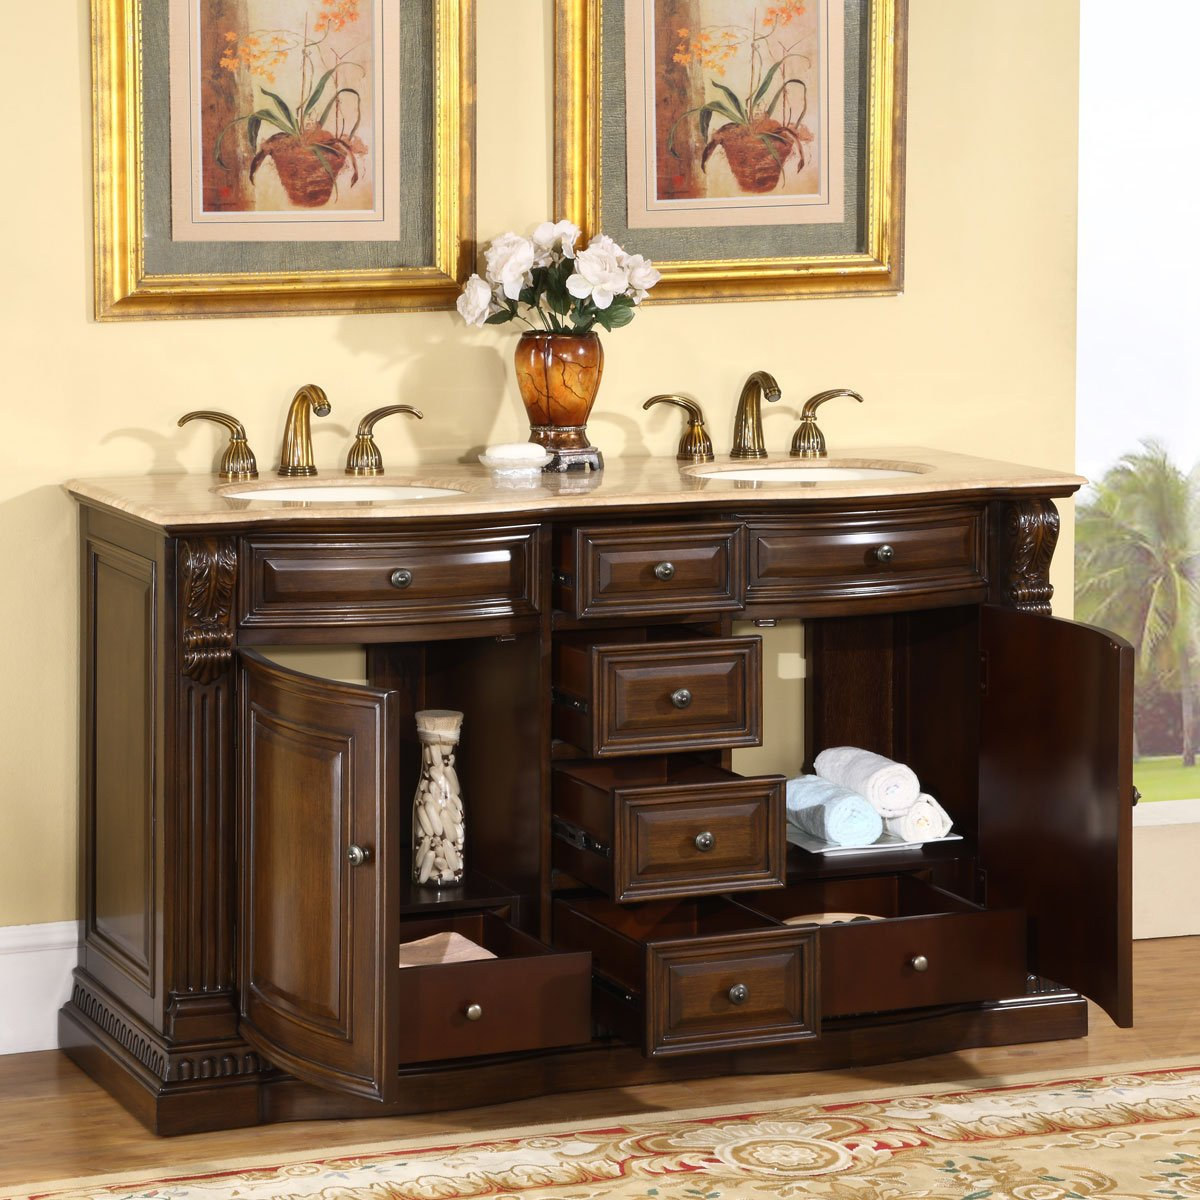 Amazon.com: Silkroad Exclusive Bathroom Vanity HYP-0712-T-UIC-60 ...